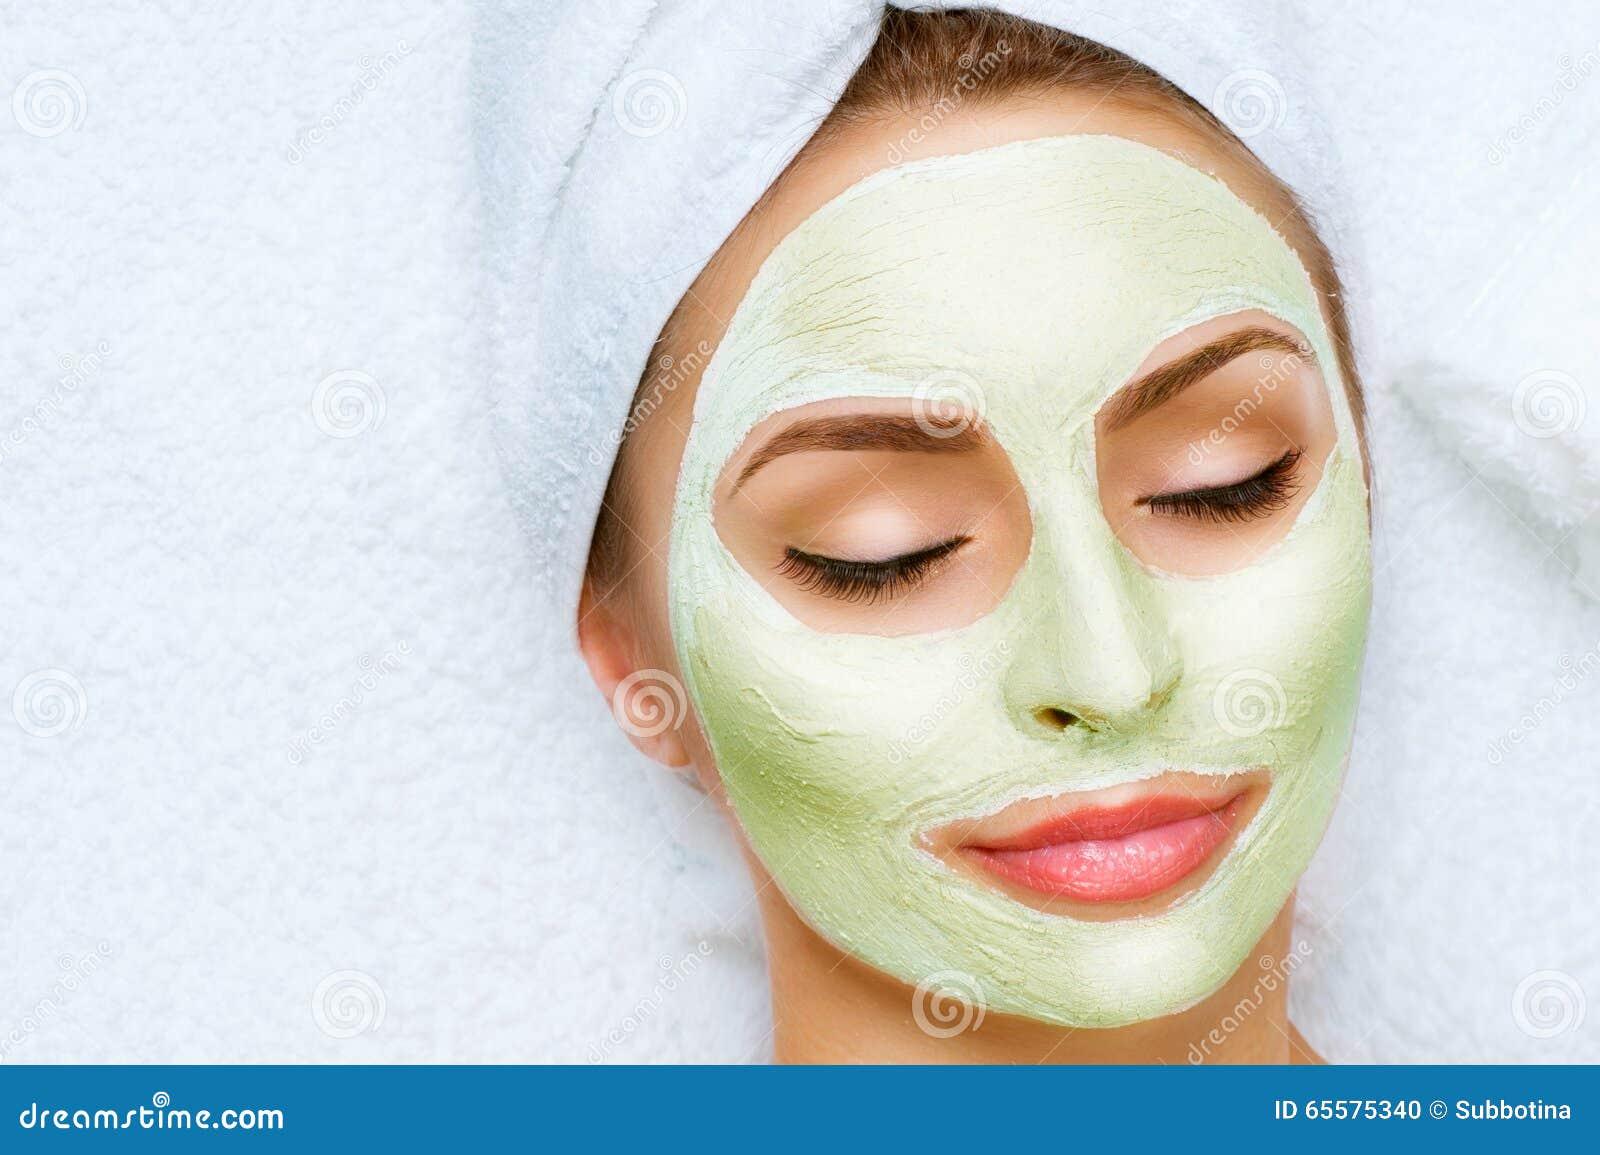 Apply facial mask hot woman